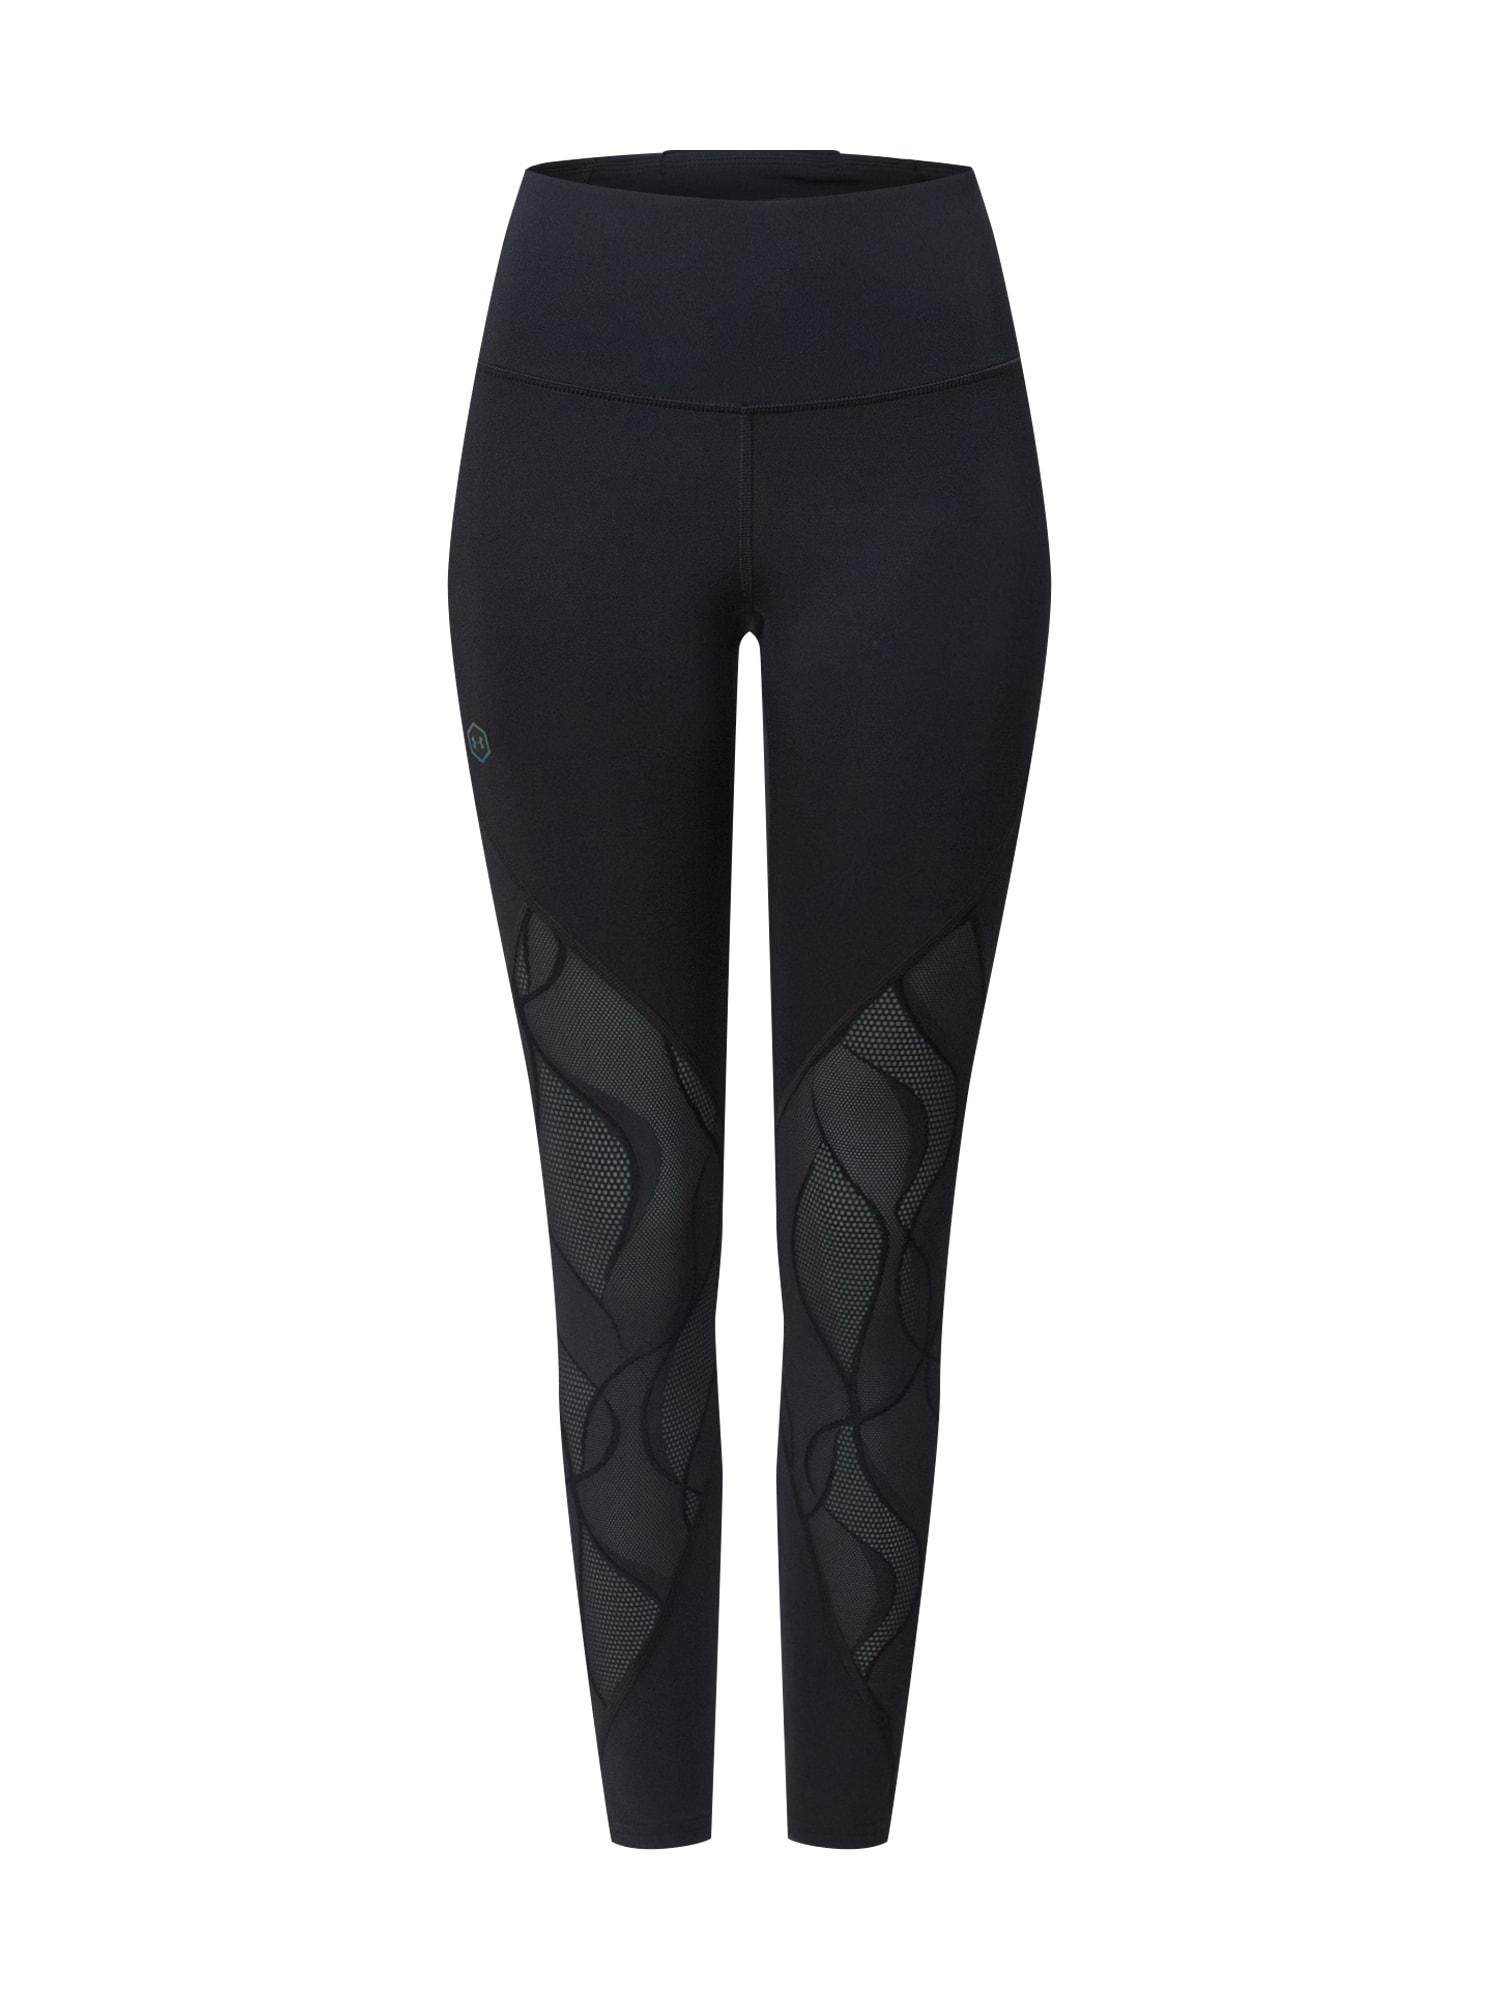 UNDER ARMOUR Športové nohavice 'Rush'  čierna